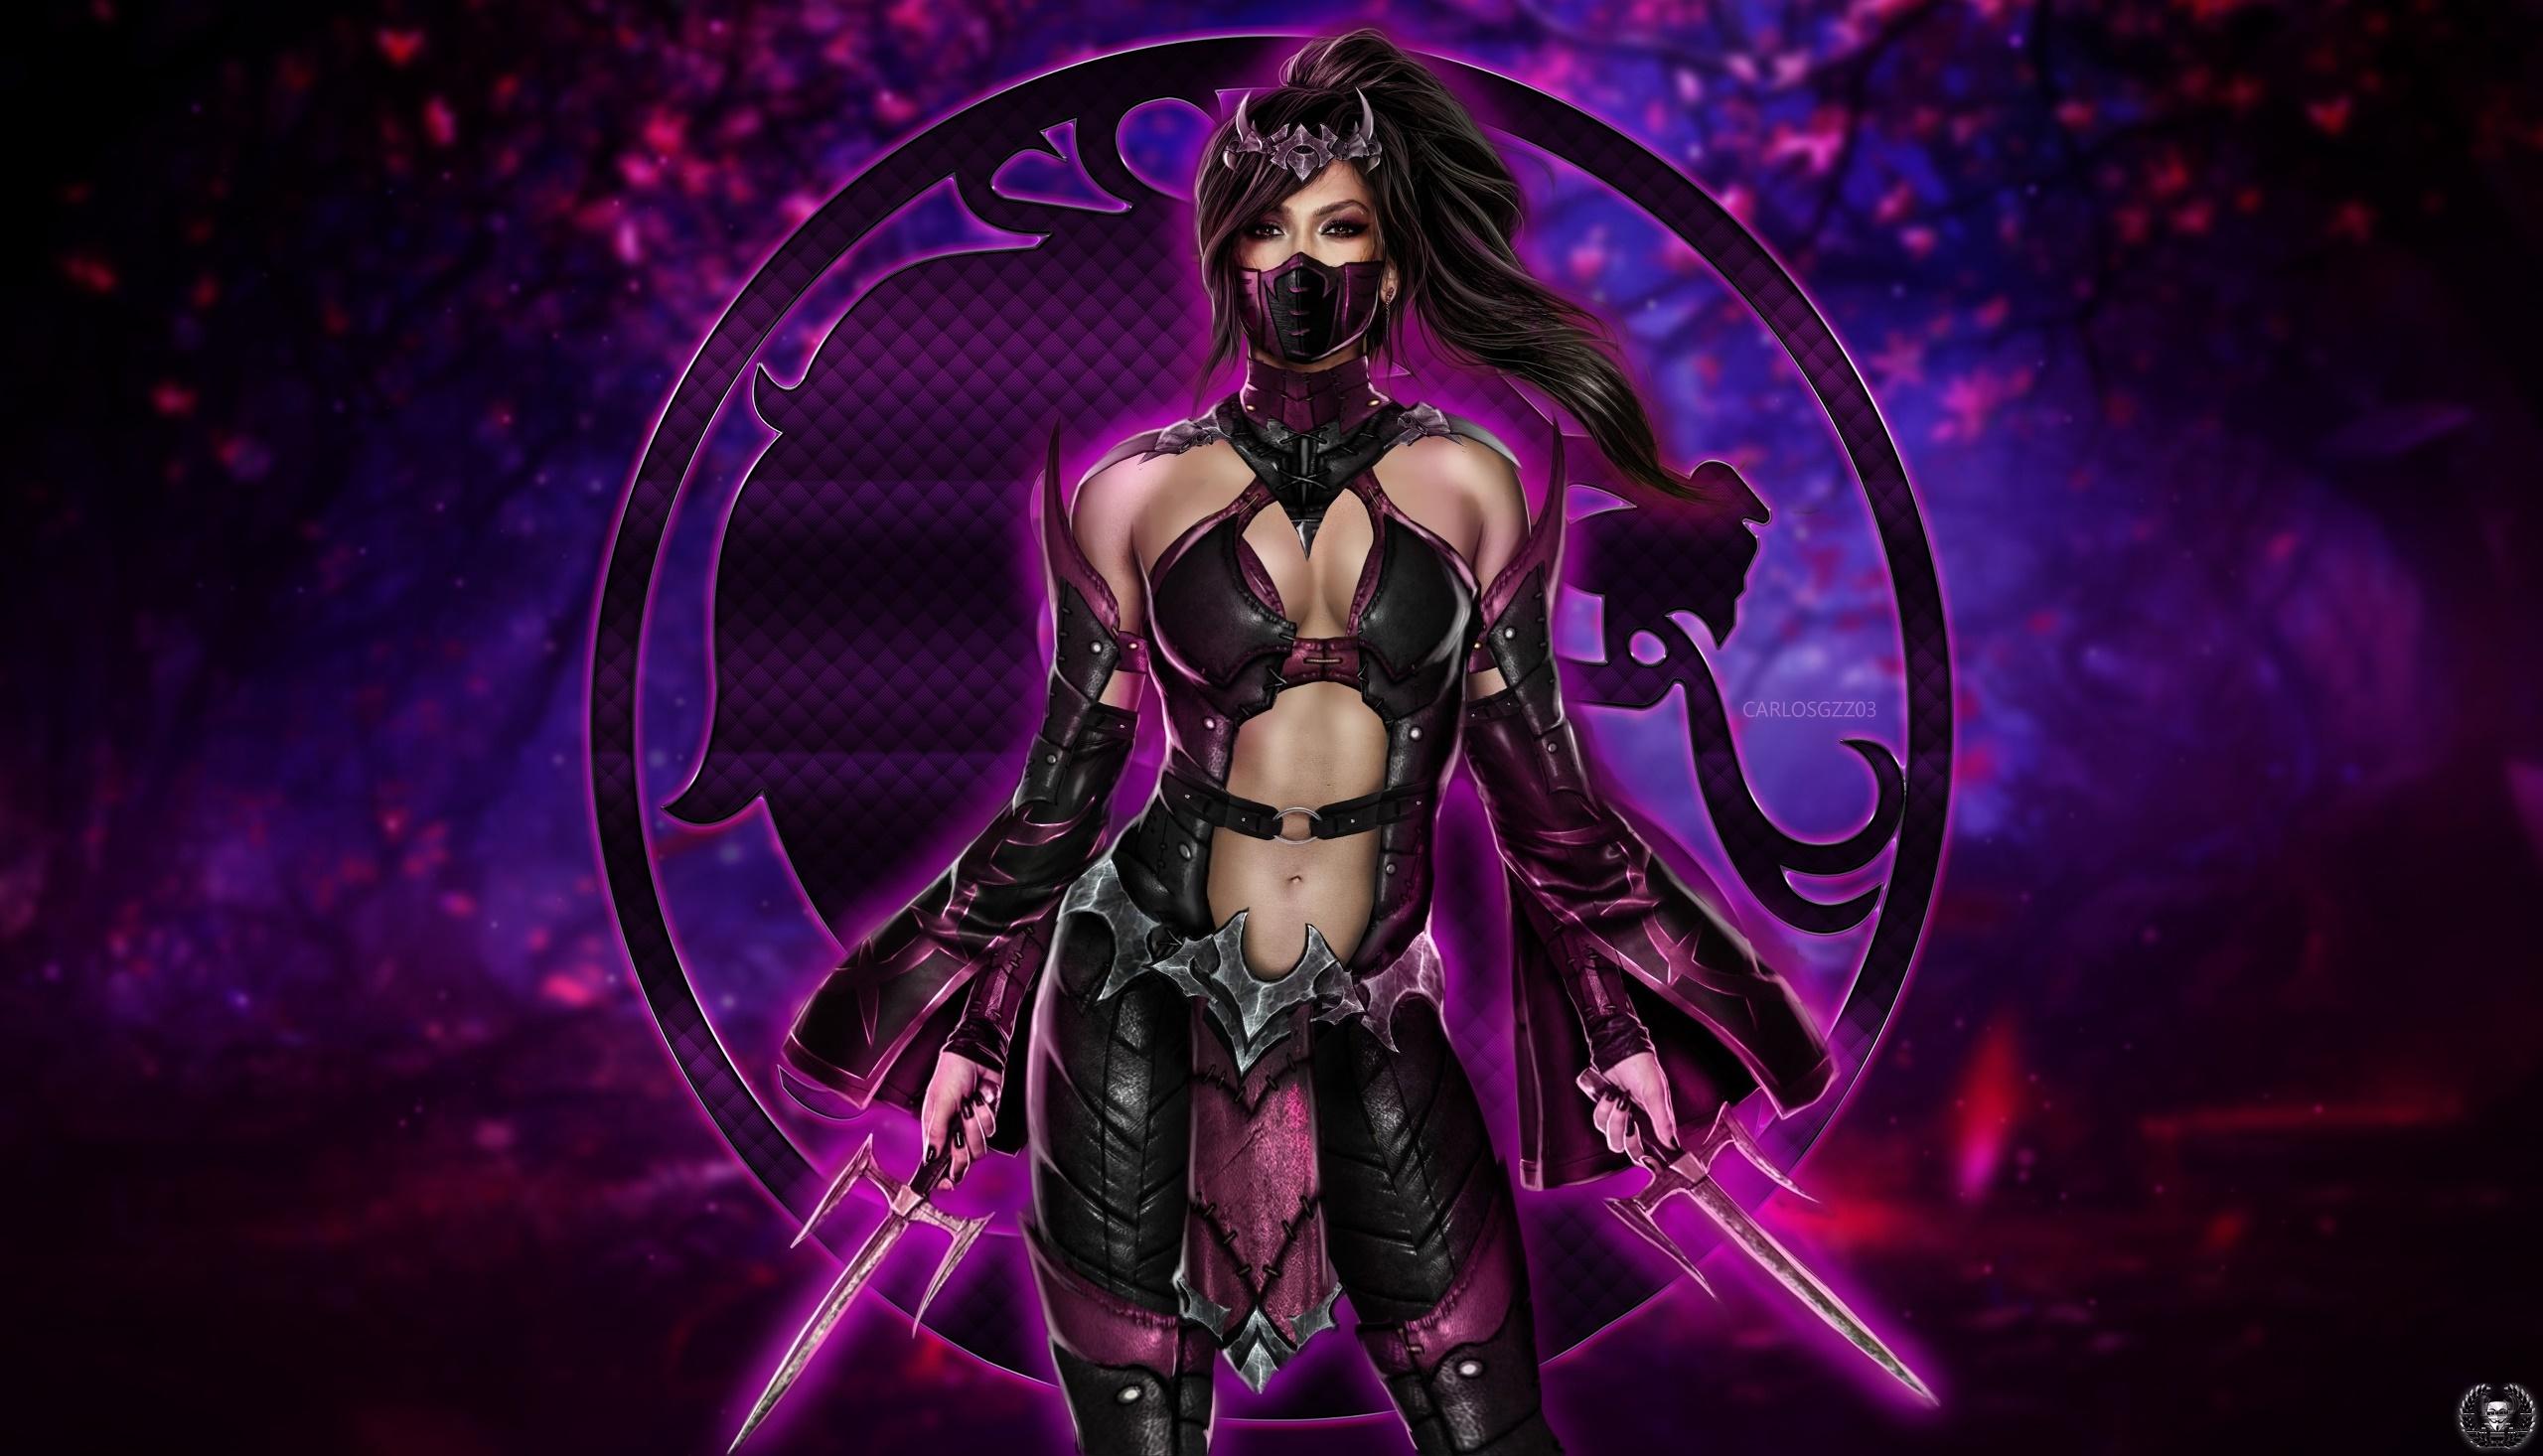 Mileena Mortal Kombat 11 Wallpaper Hd Games 4k Wallpapers Images